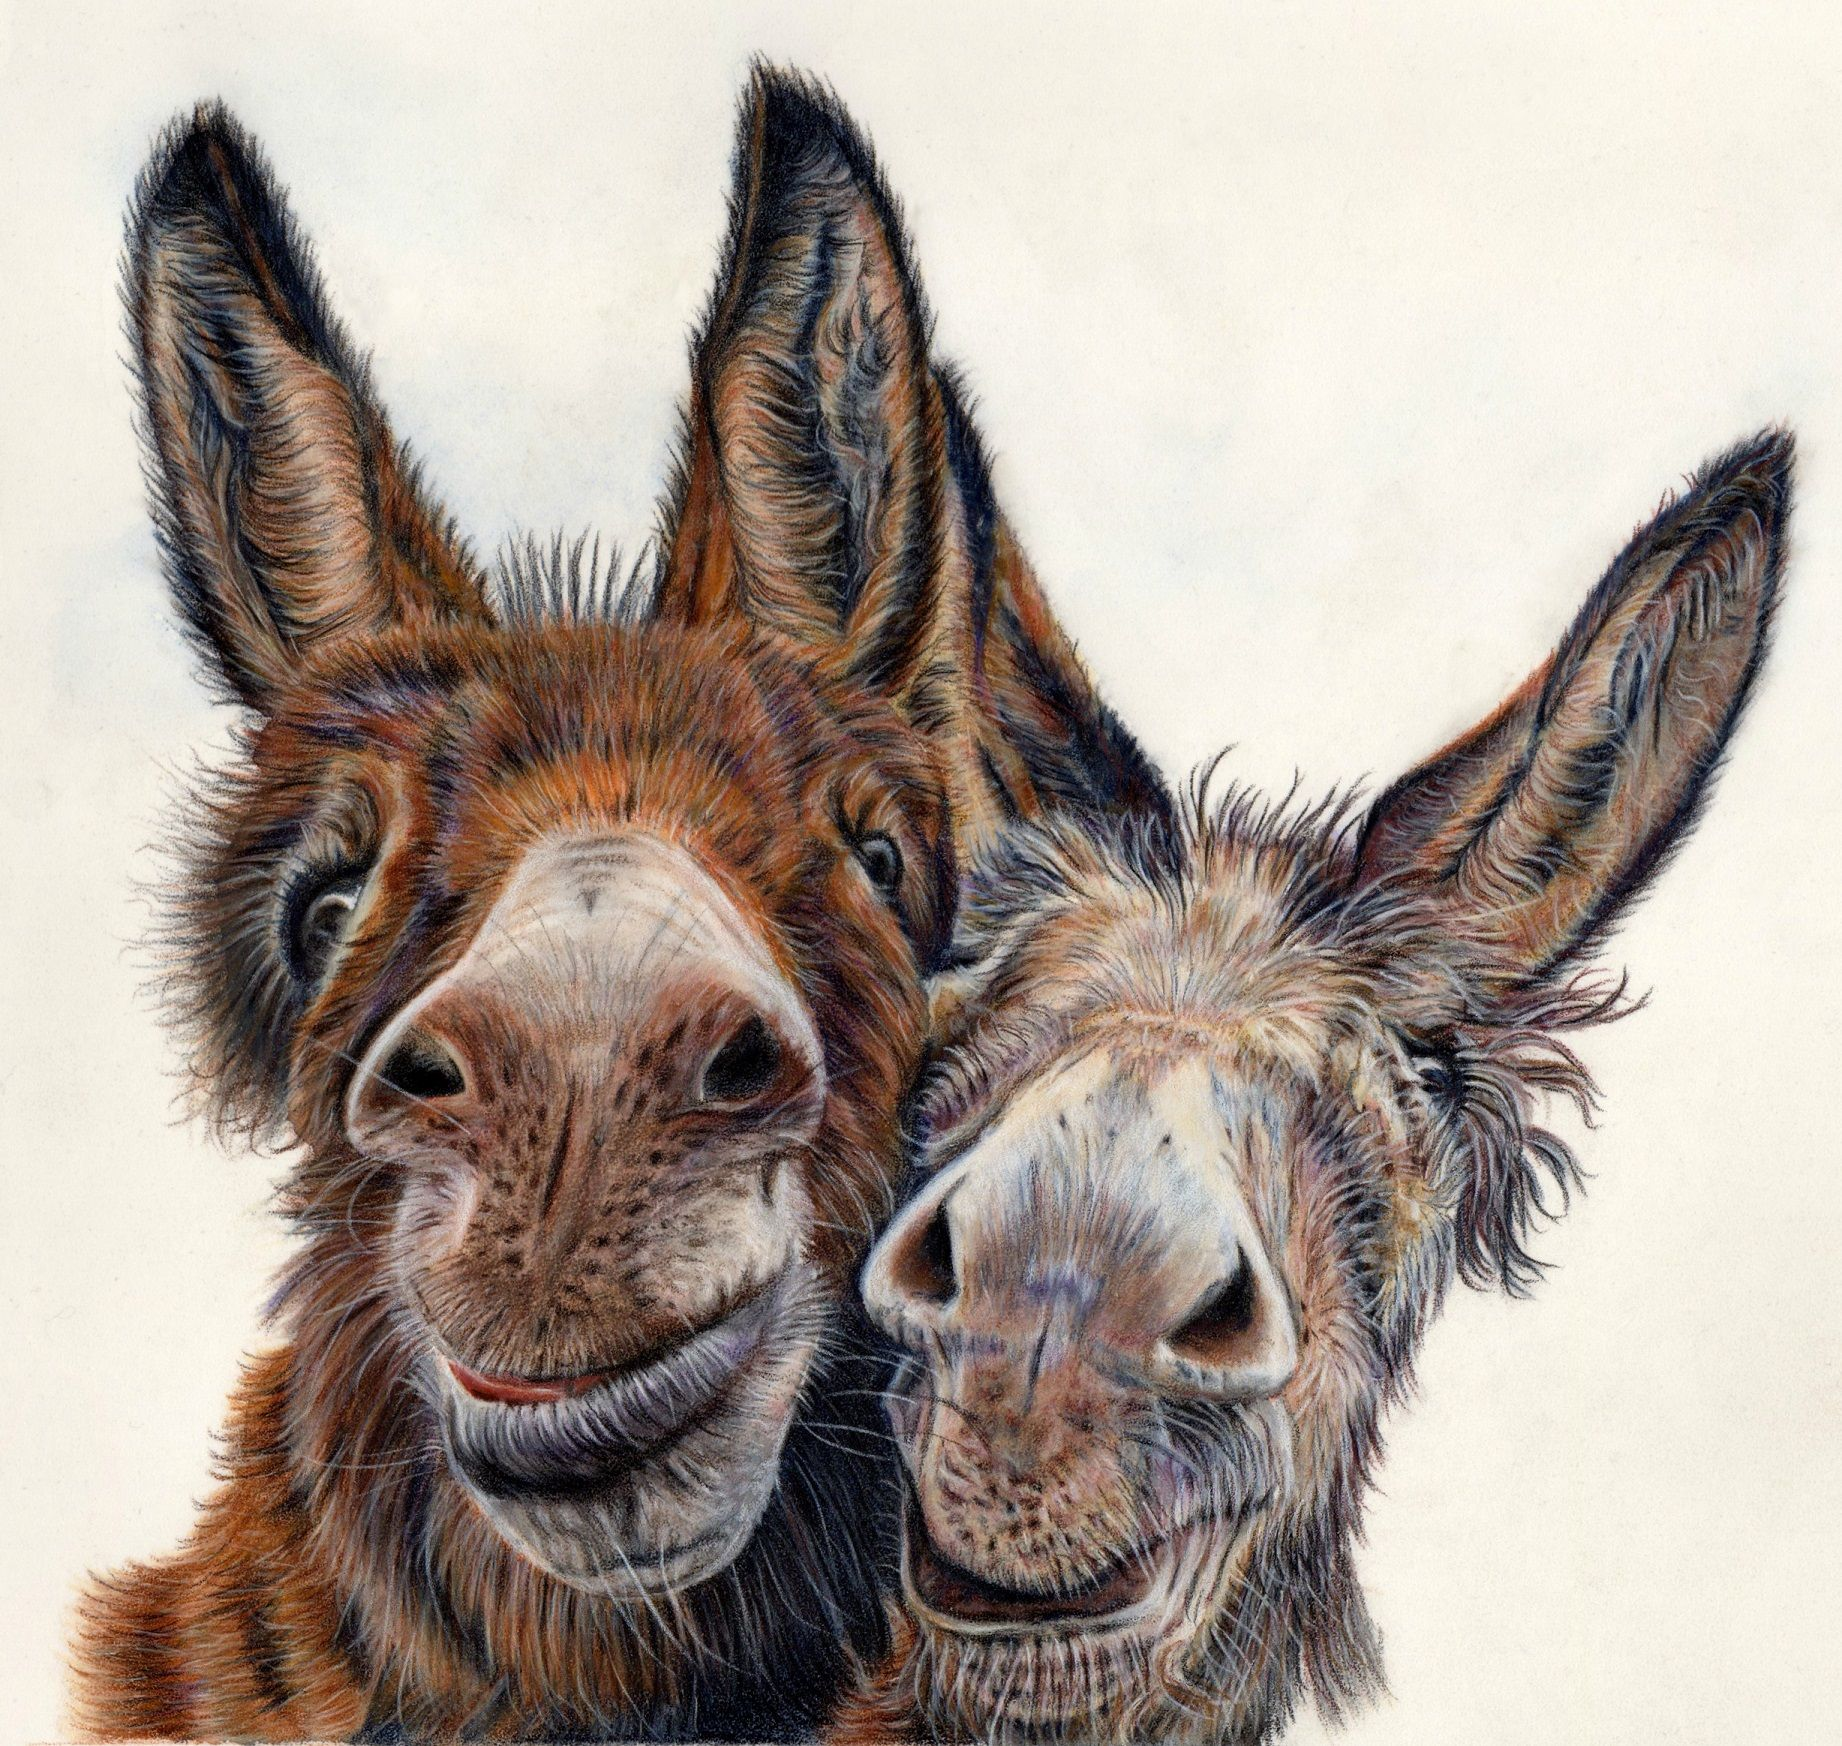 Lisa Ann Watkins Animal Art By Law Is Creating Colored -9570